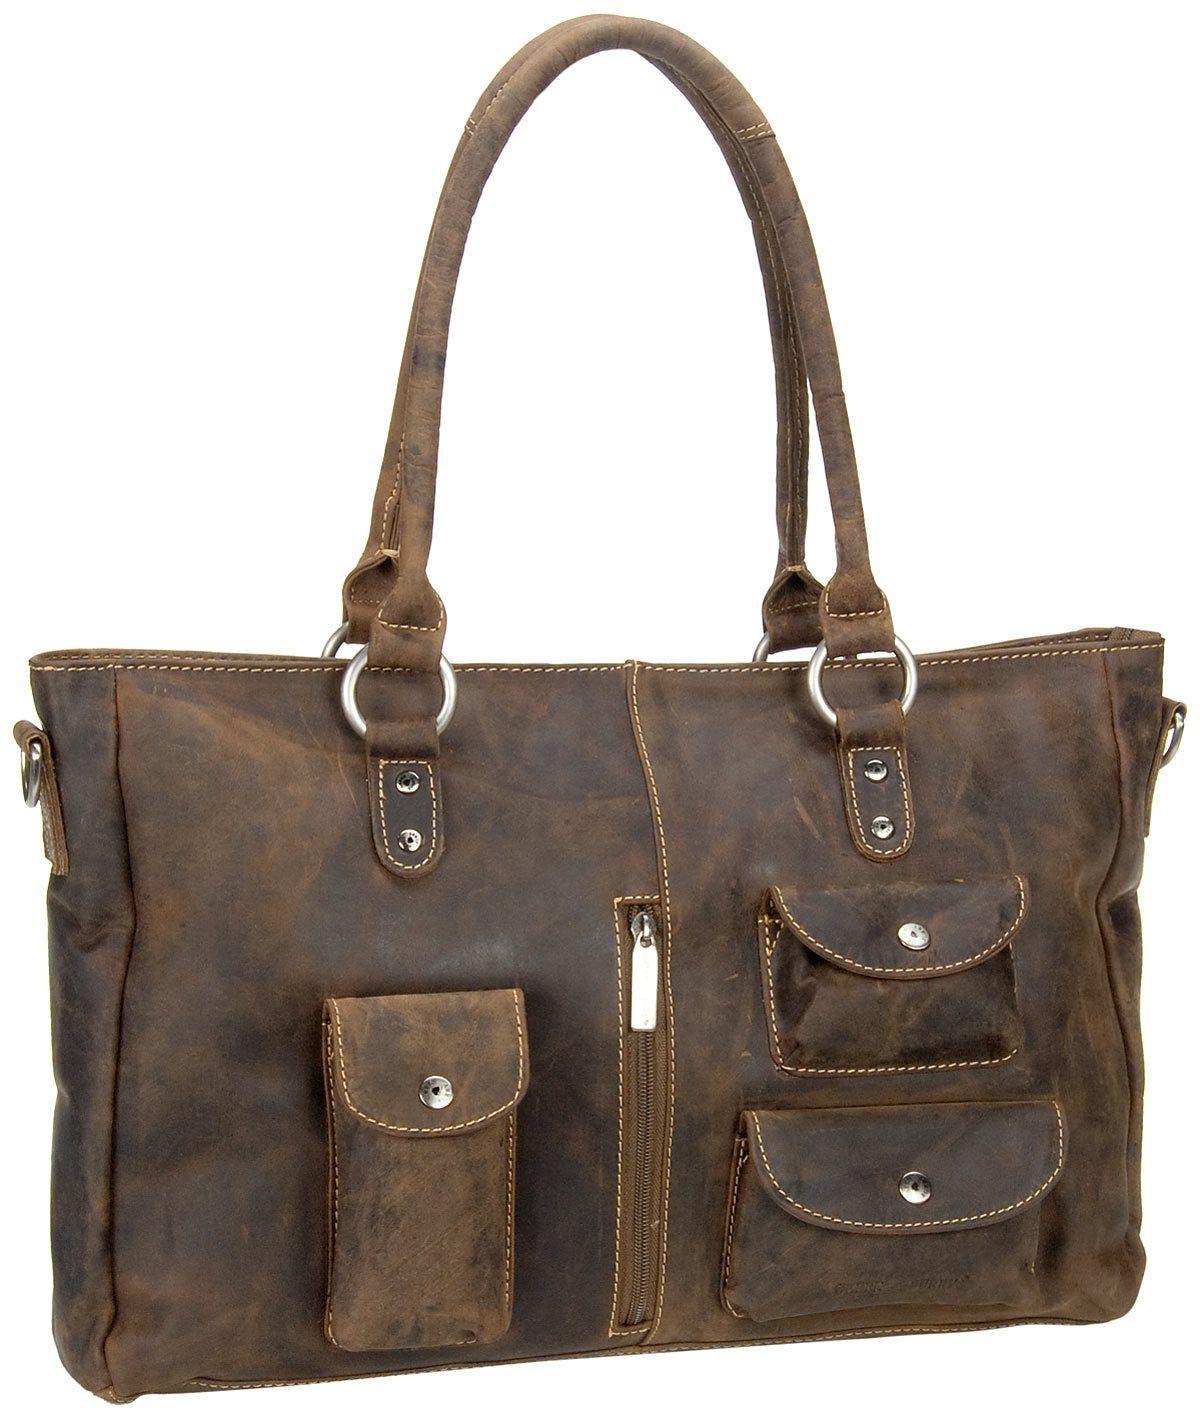 Greenburry Handtasche »Vintage Revival Vol.1 Shopper«